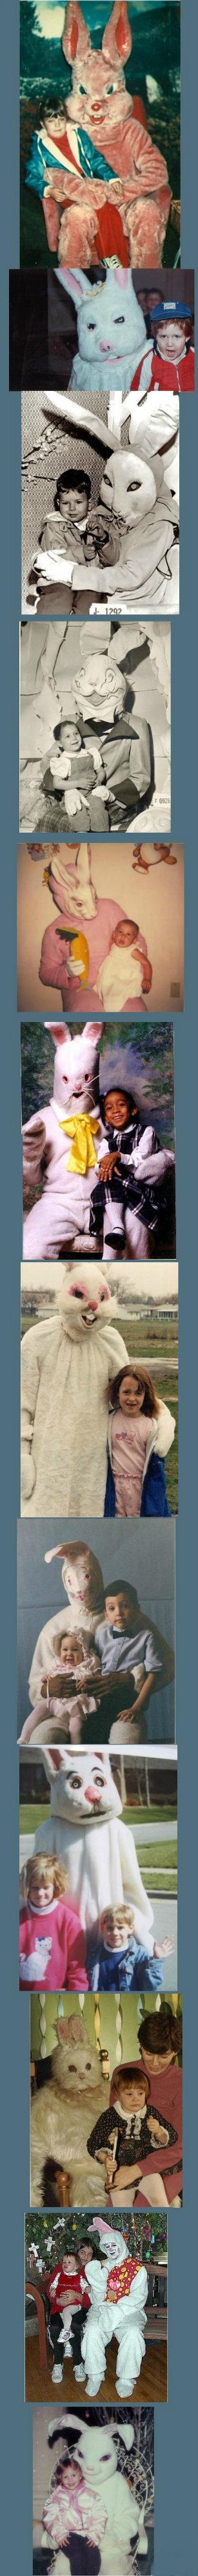 Adorable bunnies . .. 2 spooky for me Scary Bunnies